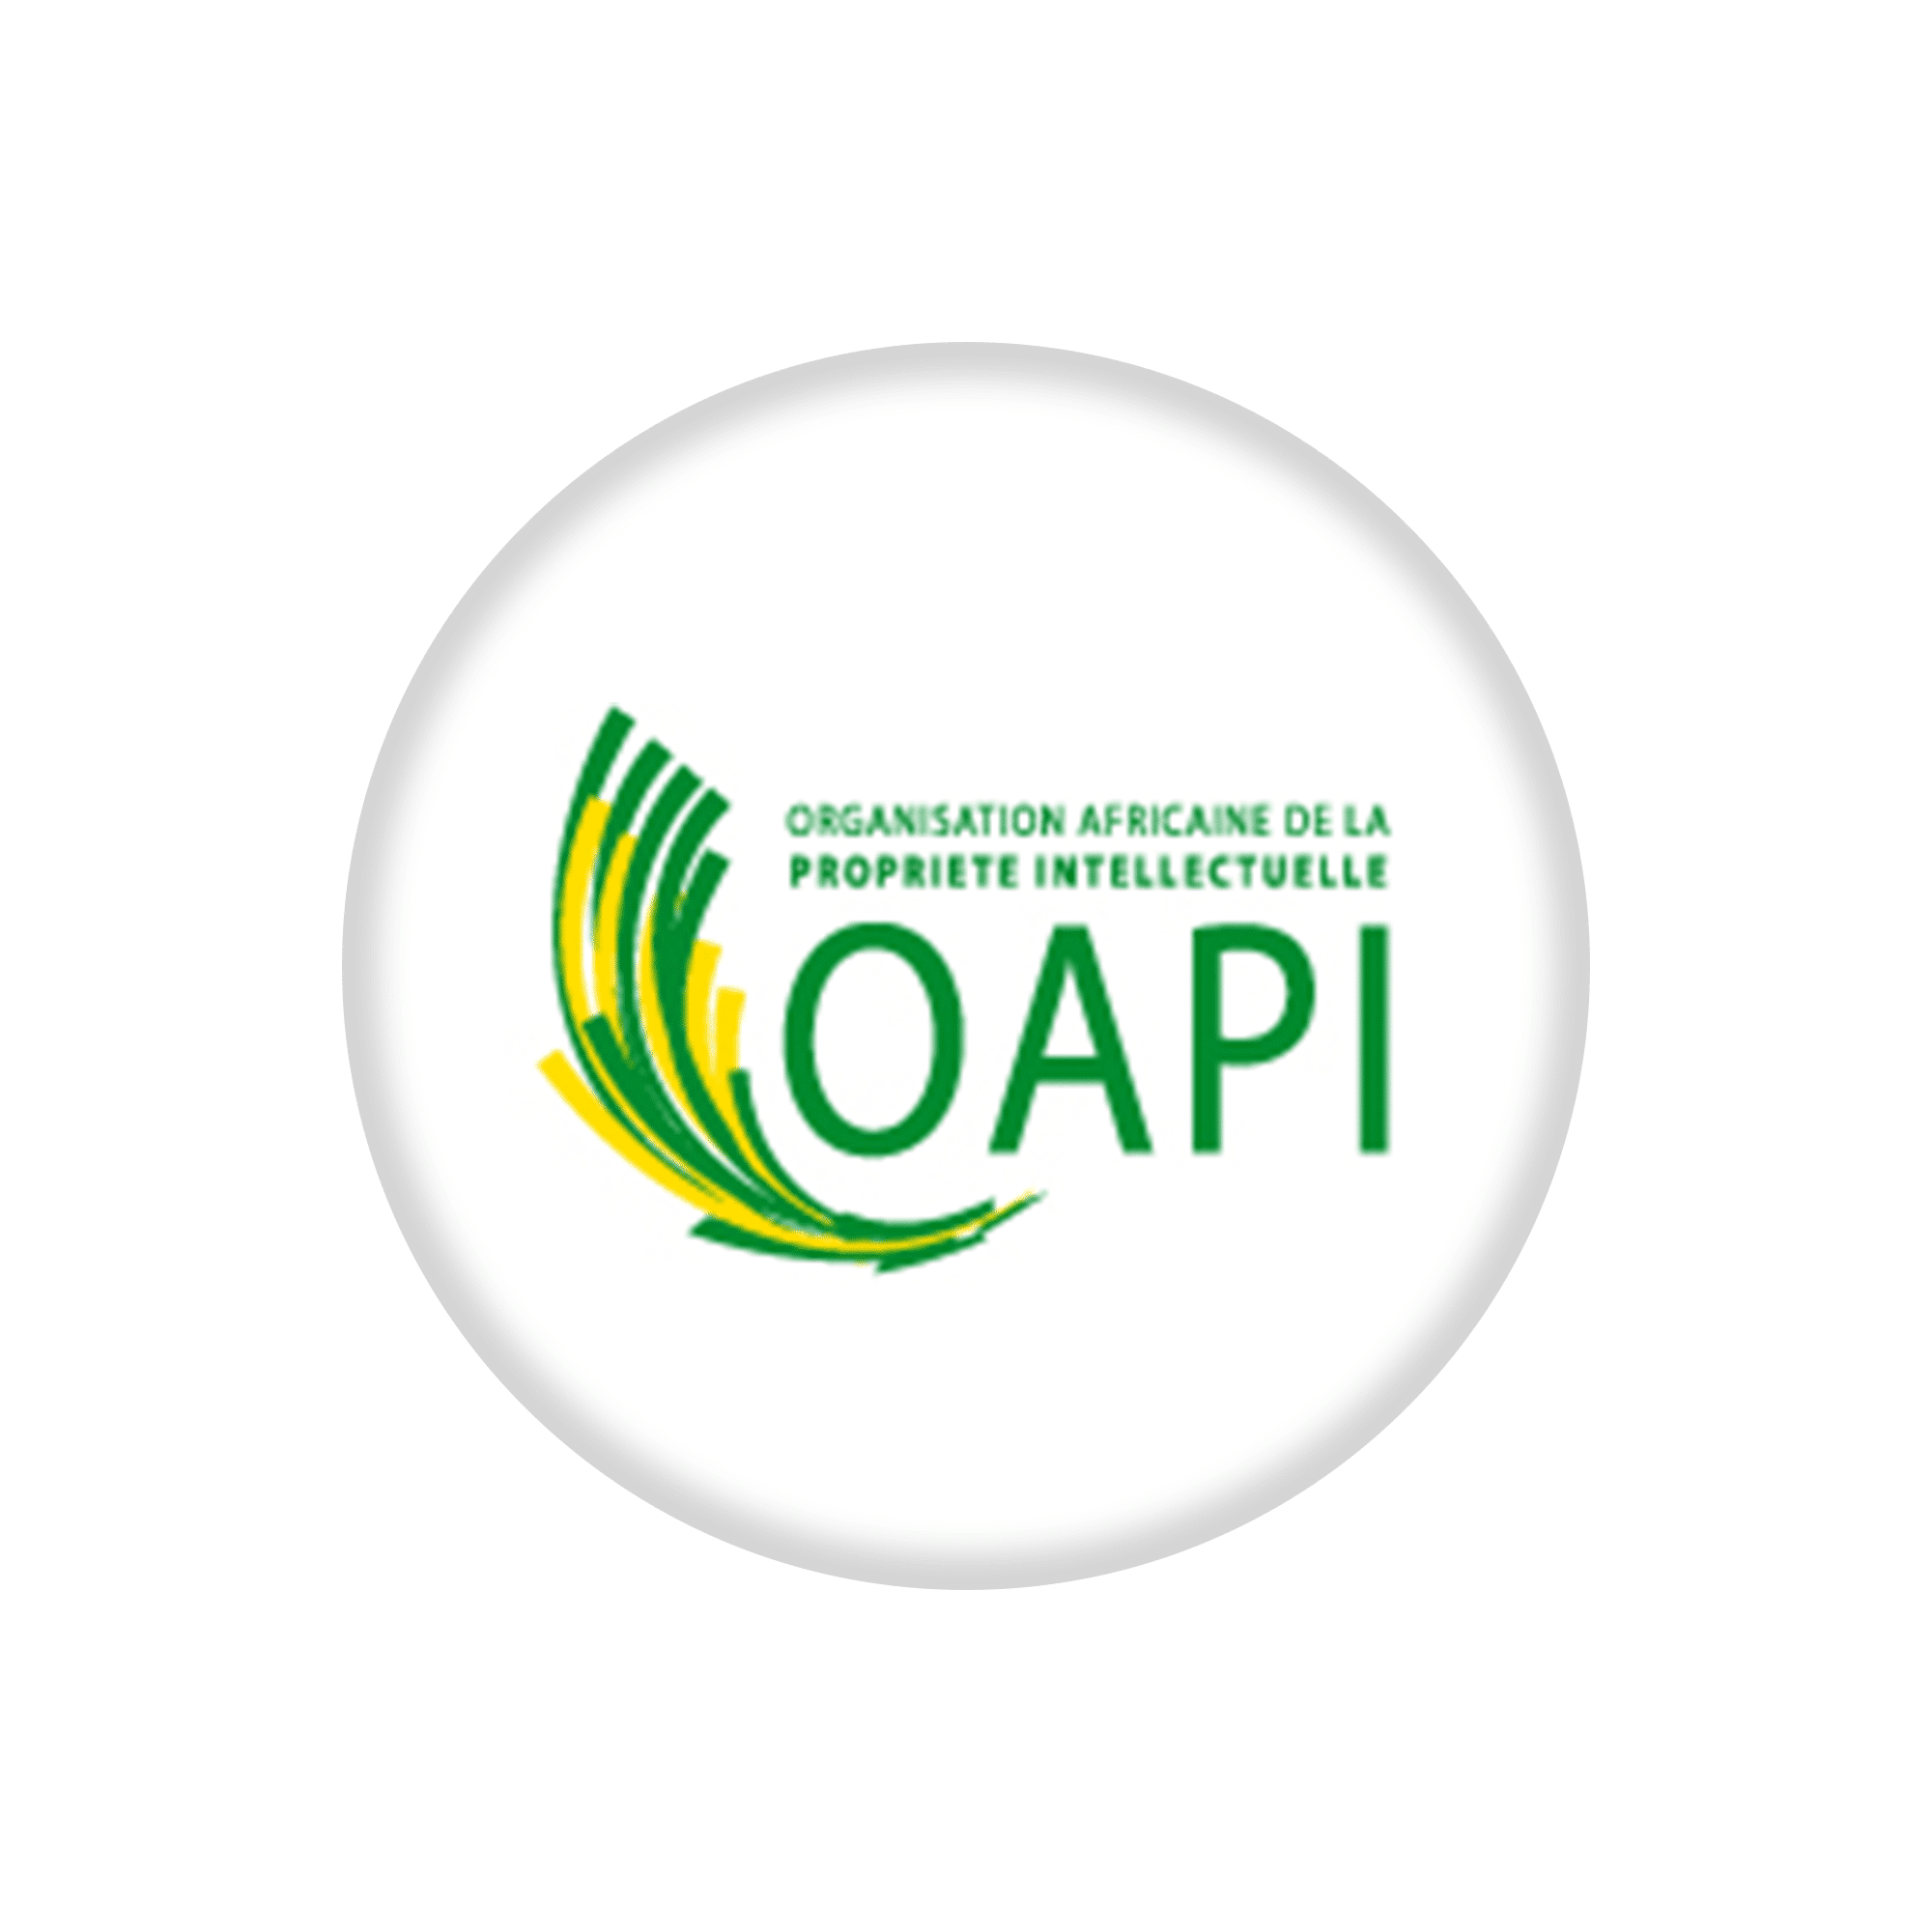 Trademark application OAPI